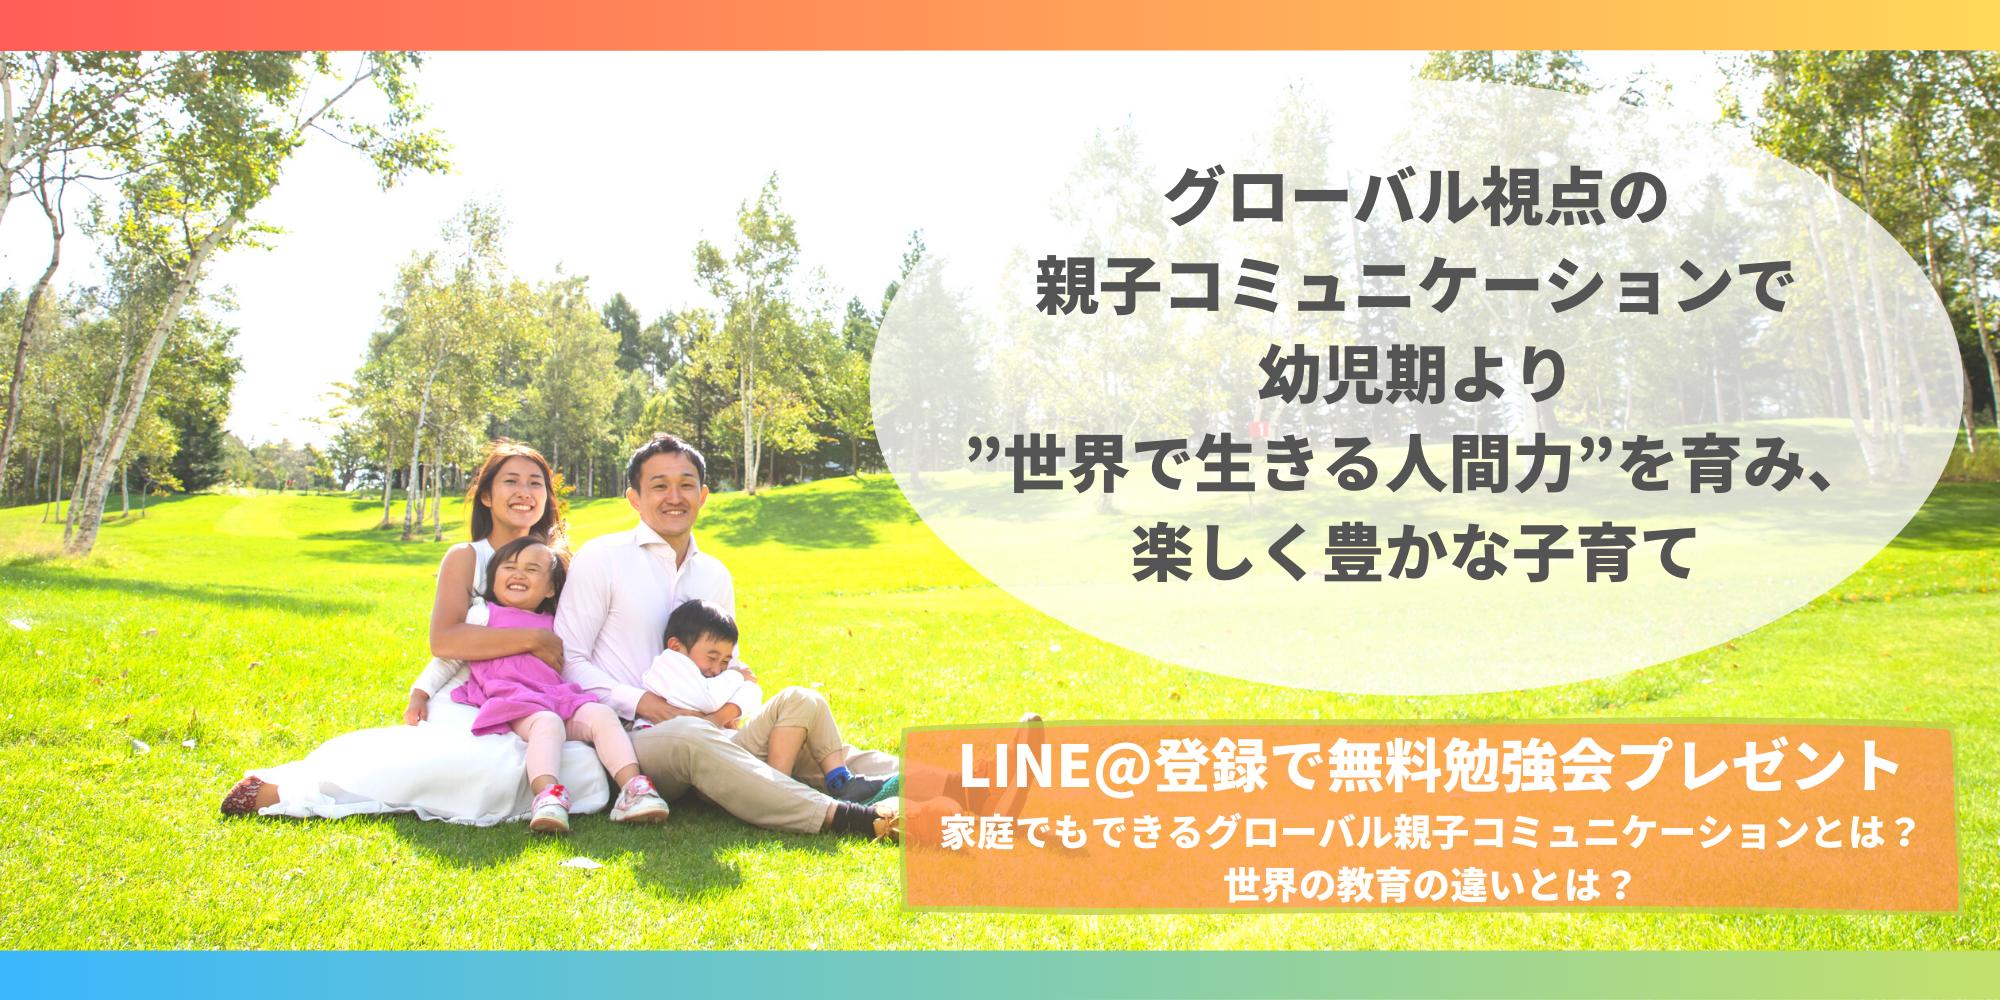 Family Journey 1.2.3